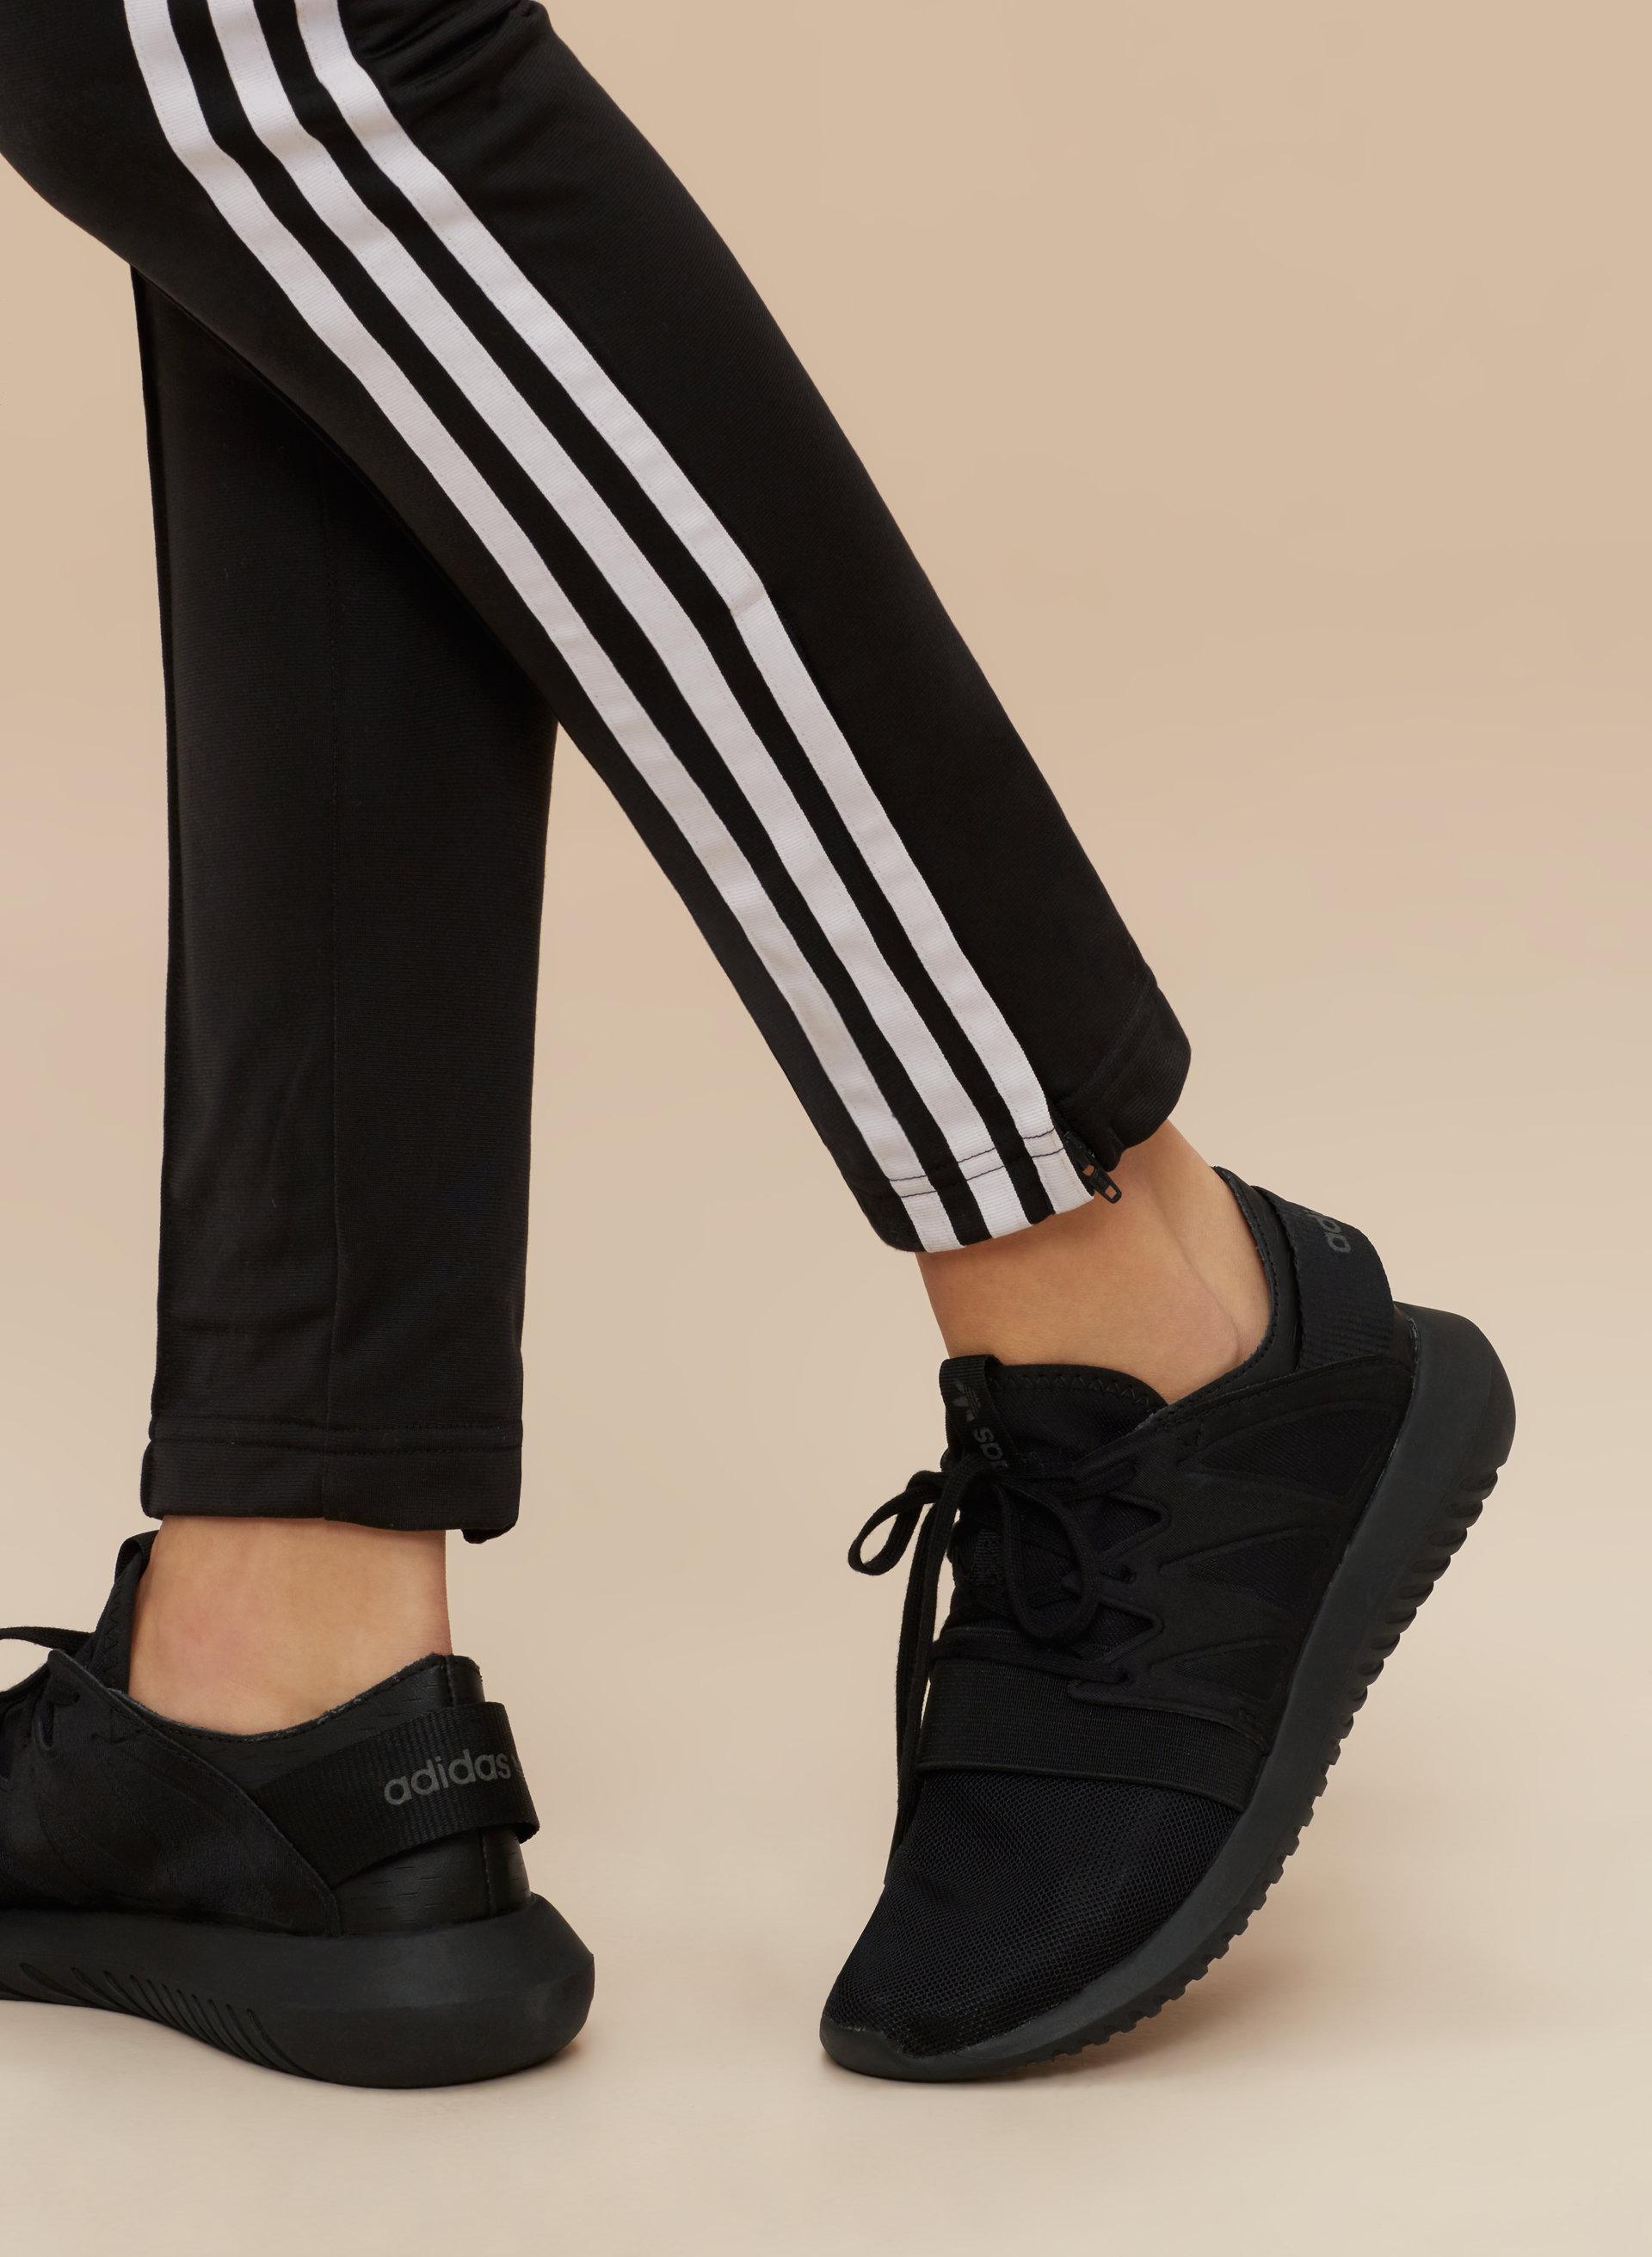 big sale 604aa f82ff Adidas Tubular Viral Sneaker flagstandards.co.uk